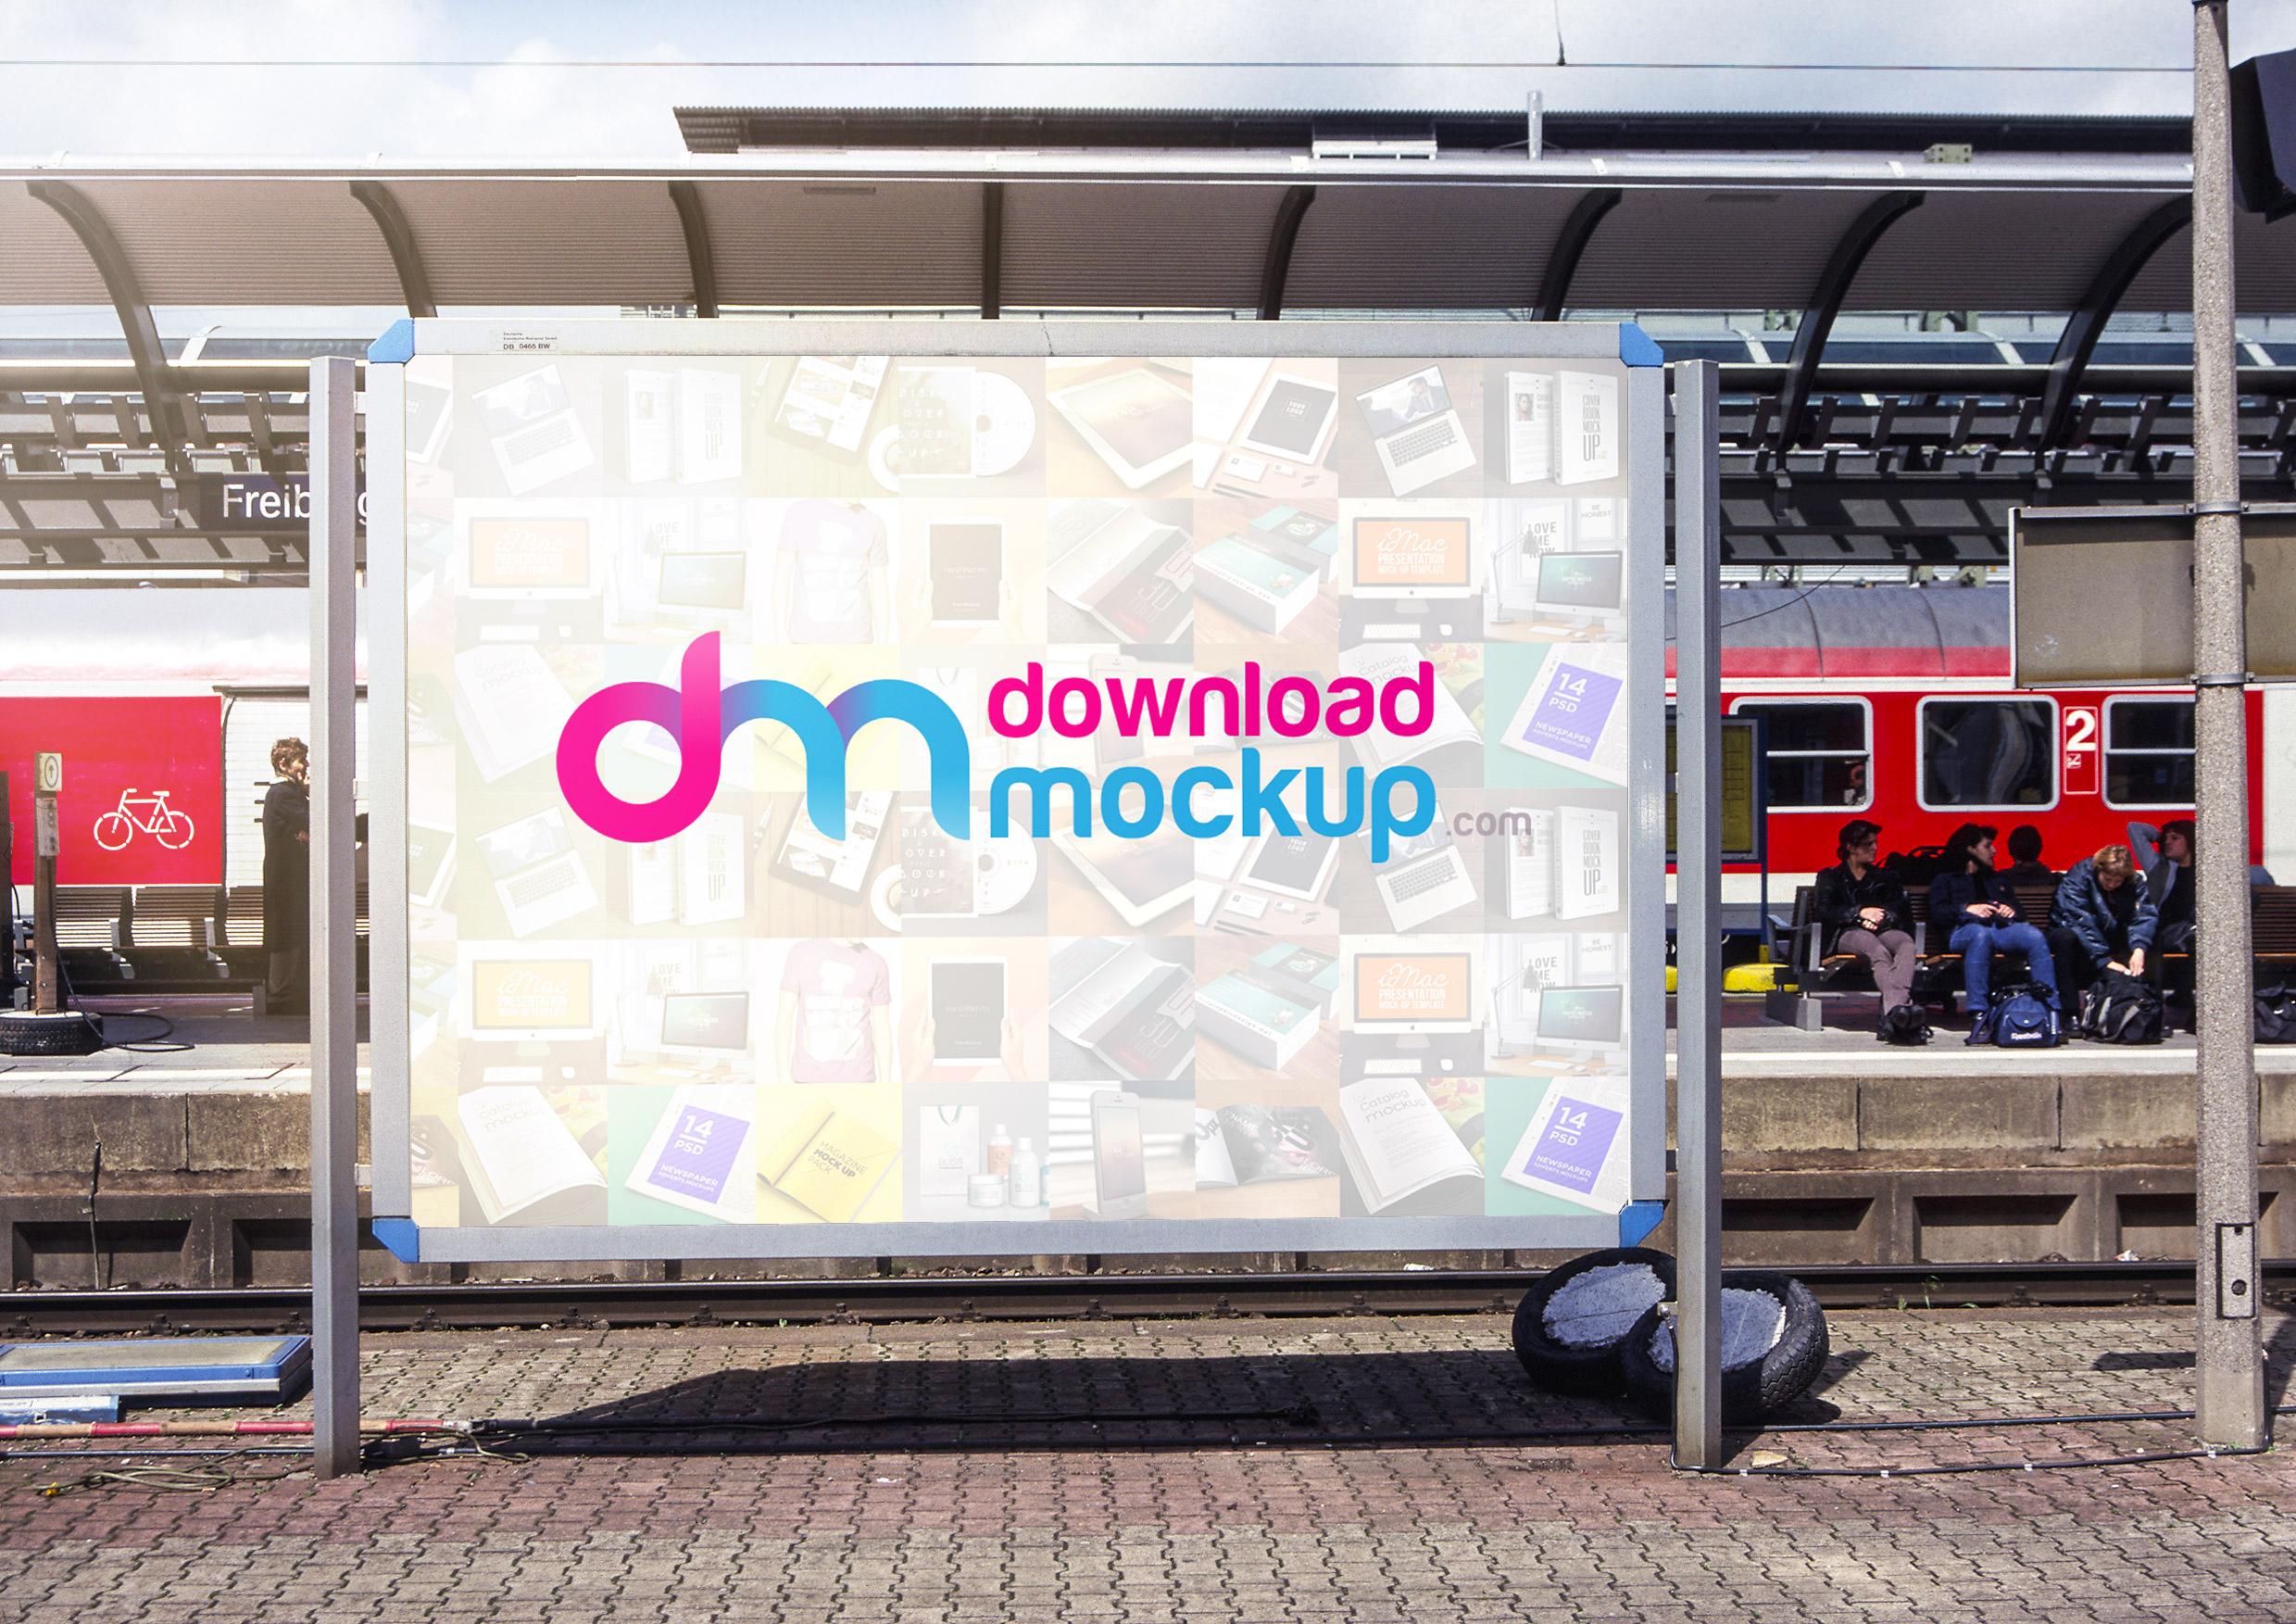 outdoor billboard mockup free psd download psd